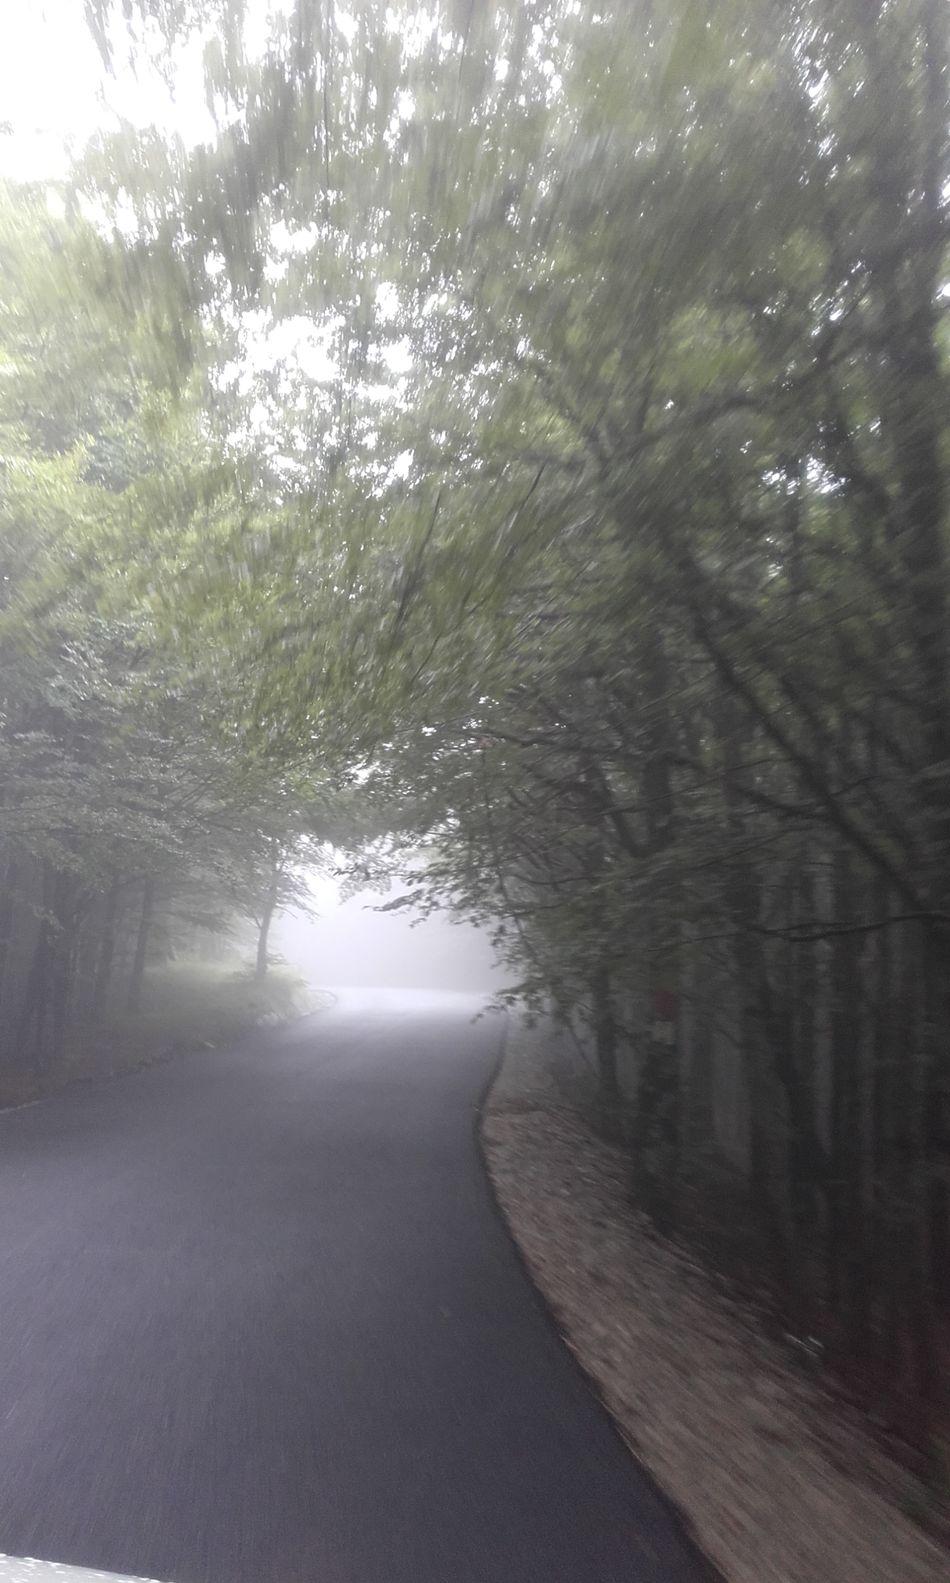 Foggyroad Beautiful Day Romania Cheia First Eyeem Photo